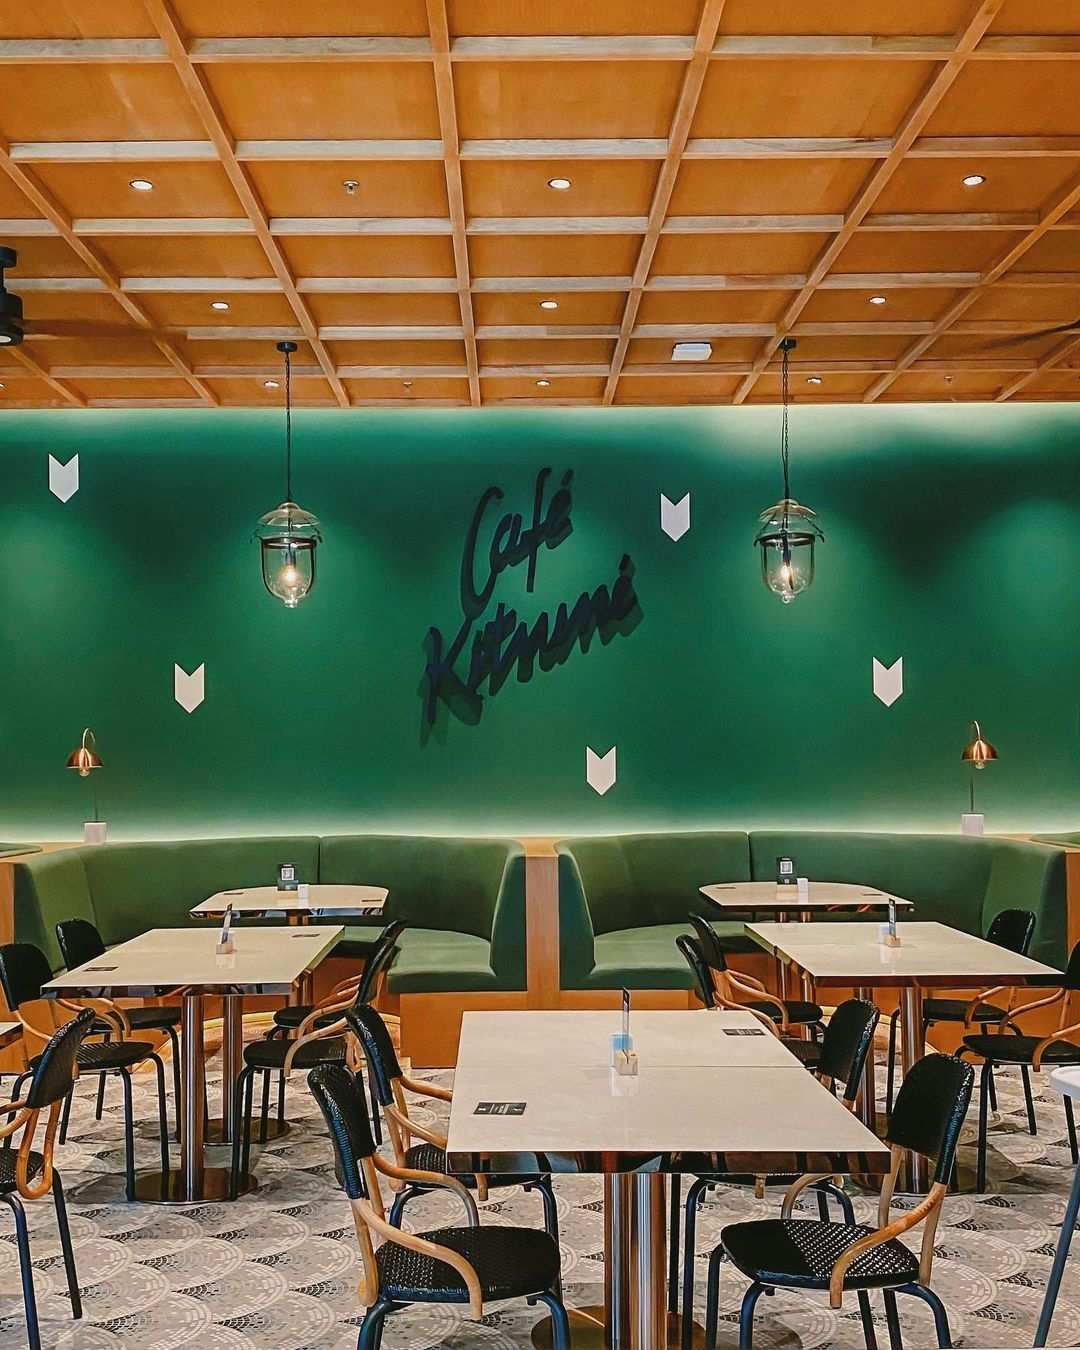 Desain Interior di Cafe Kitsune Jakarta Image From @echasyahrir